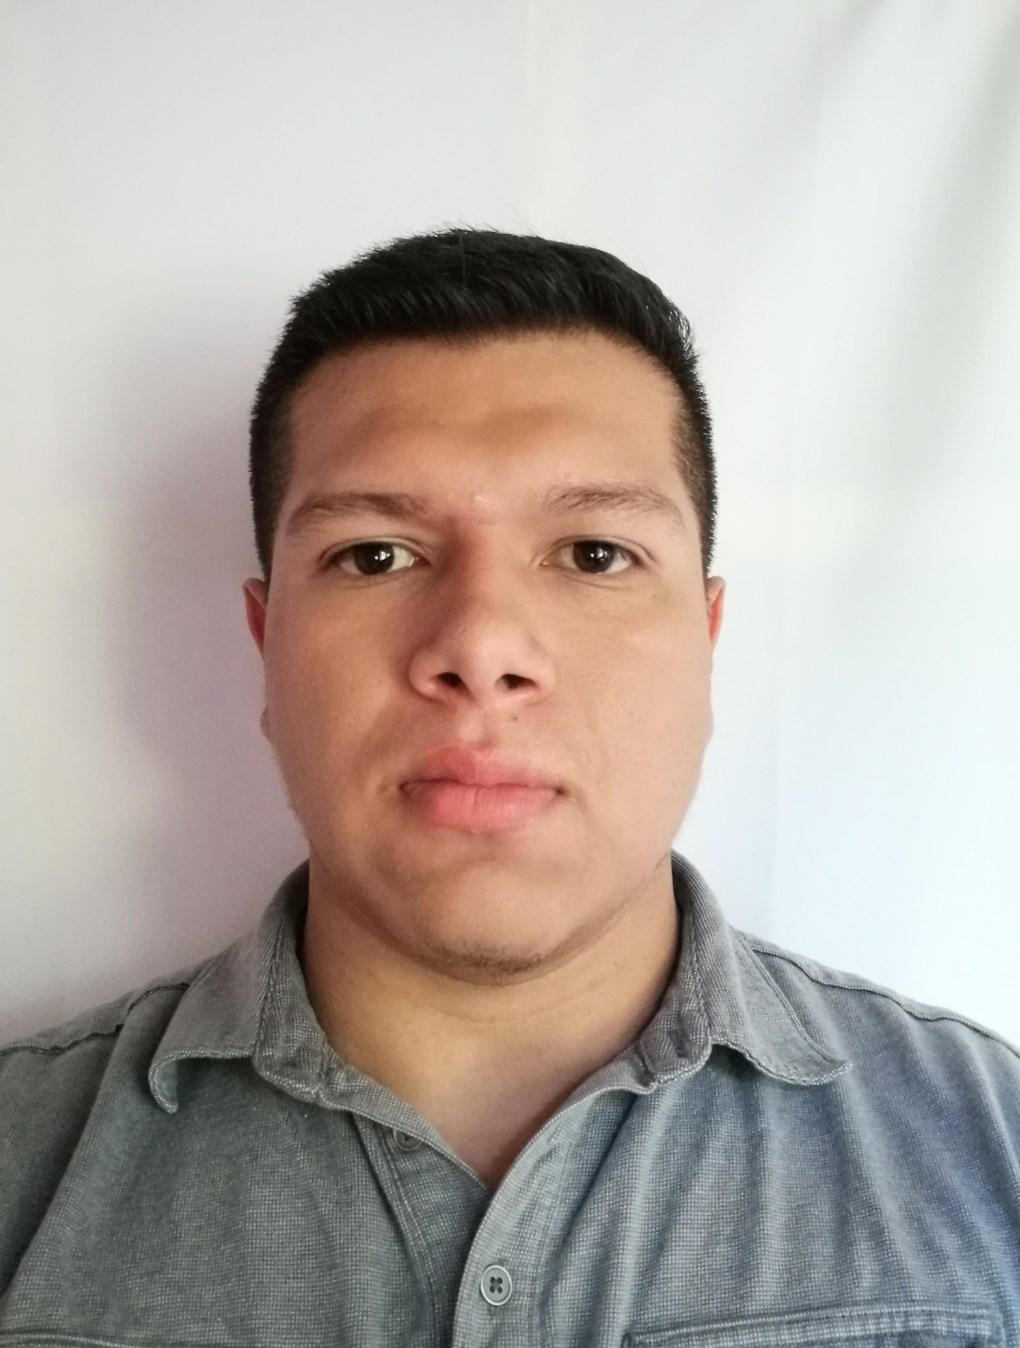 CPEF-T2A0320 Arturo Jesús Saenz Tapia